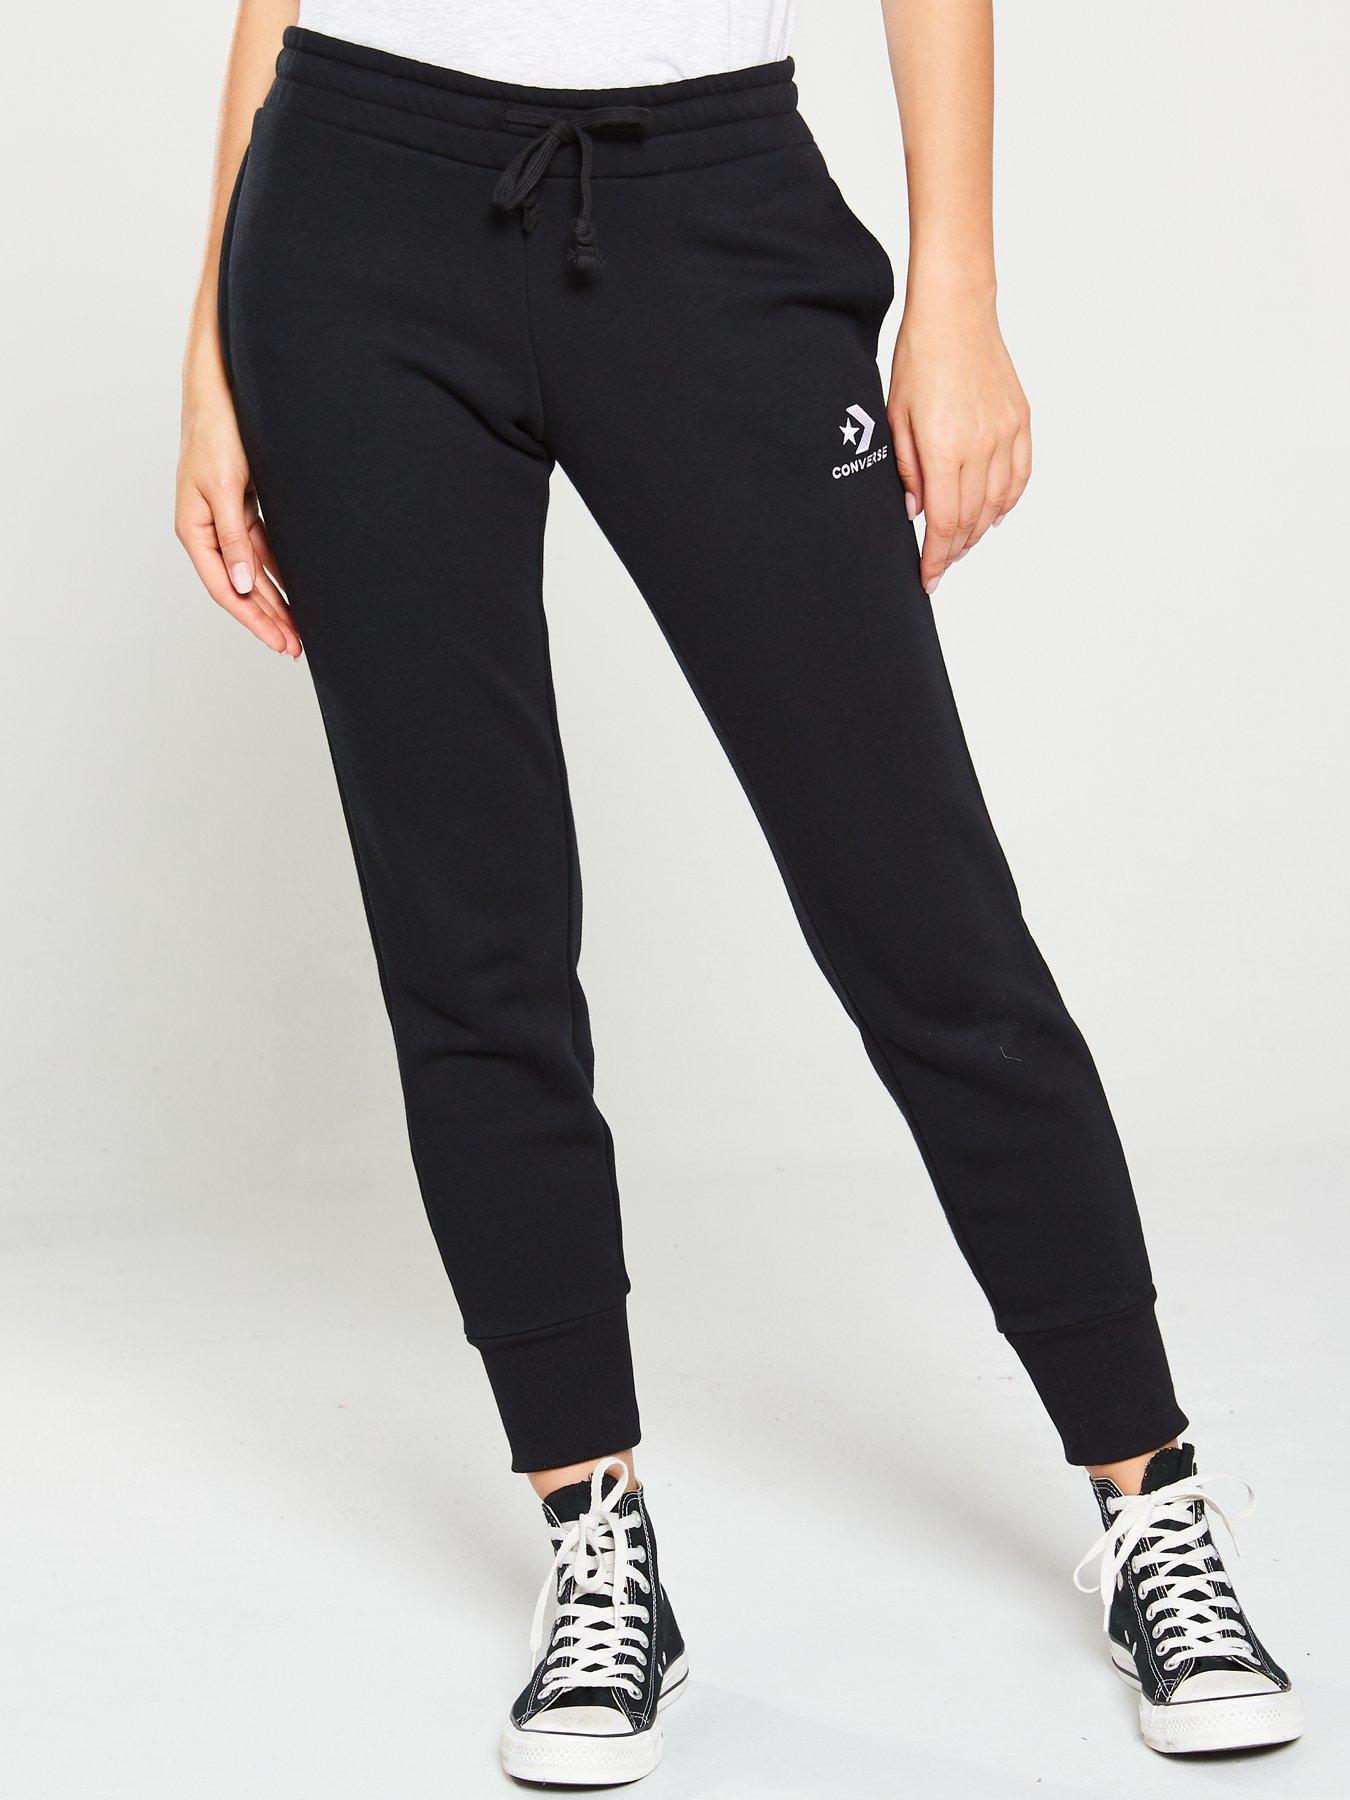 Converse | Jogging bottoms | Sportswear